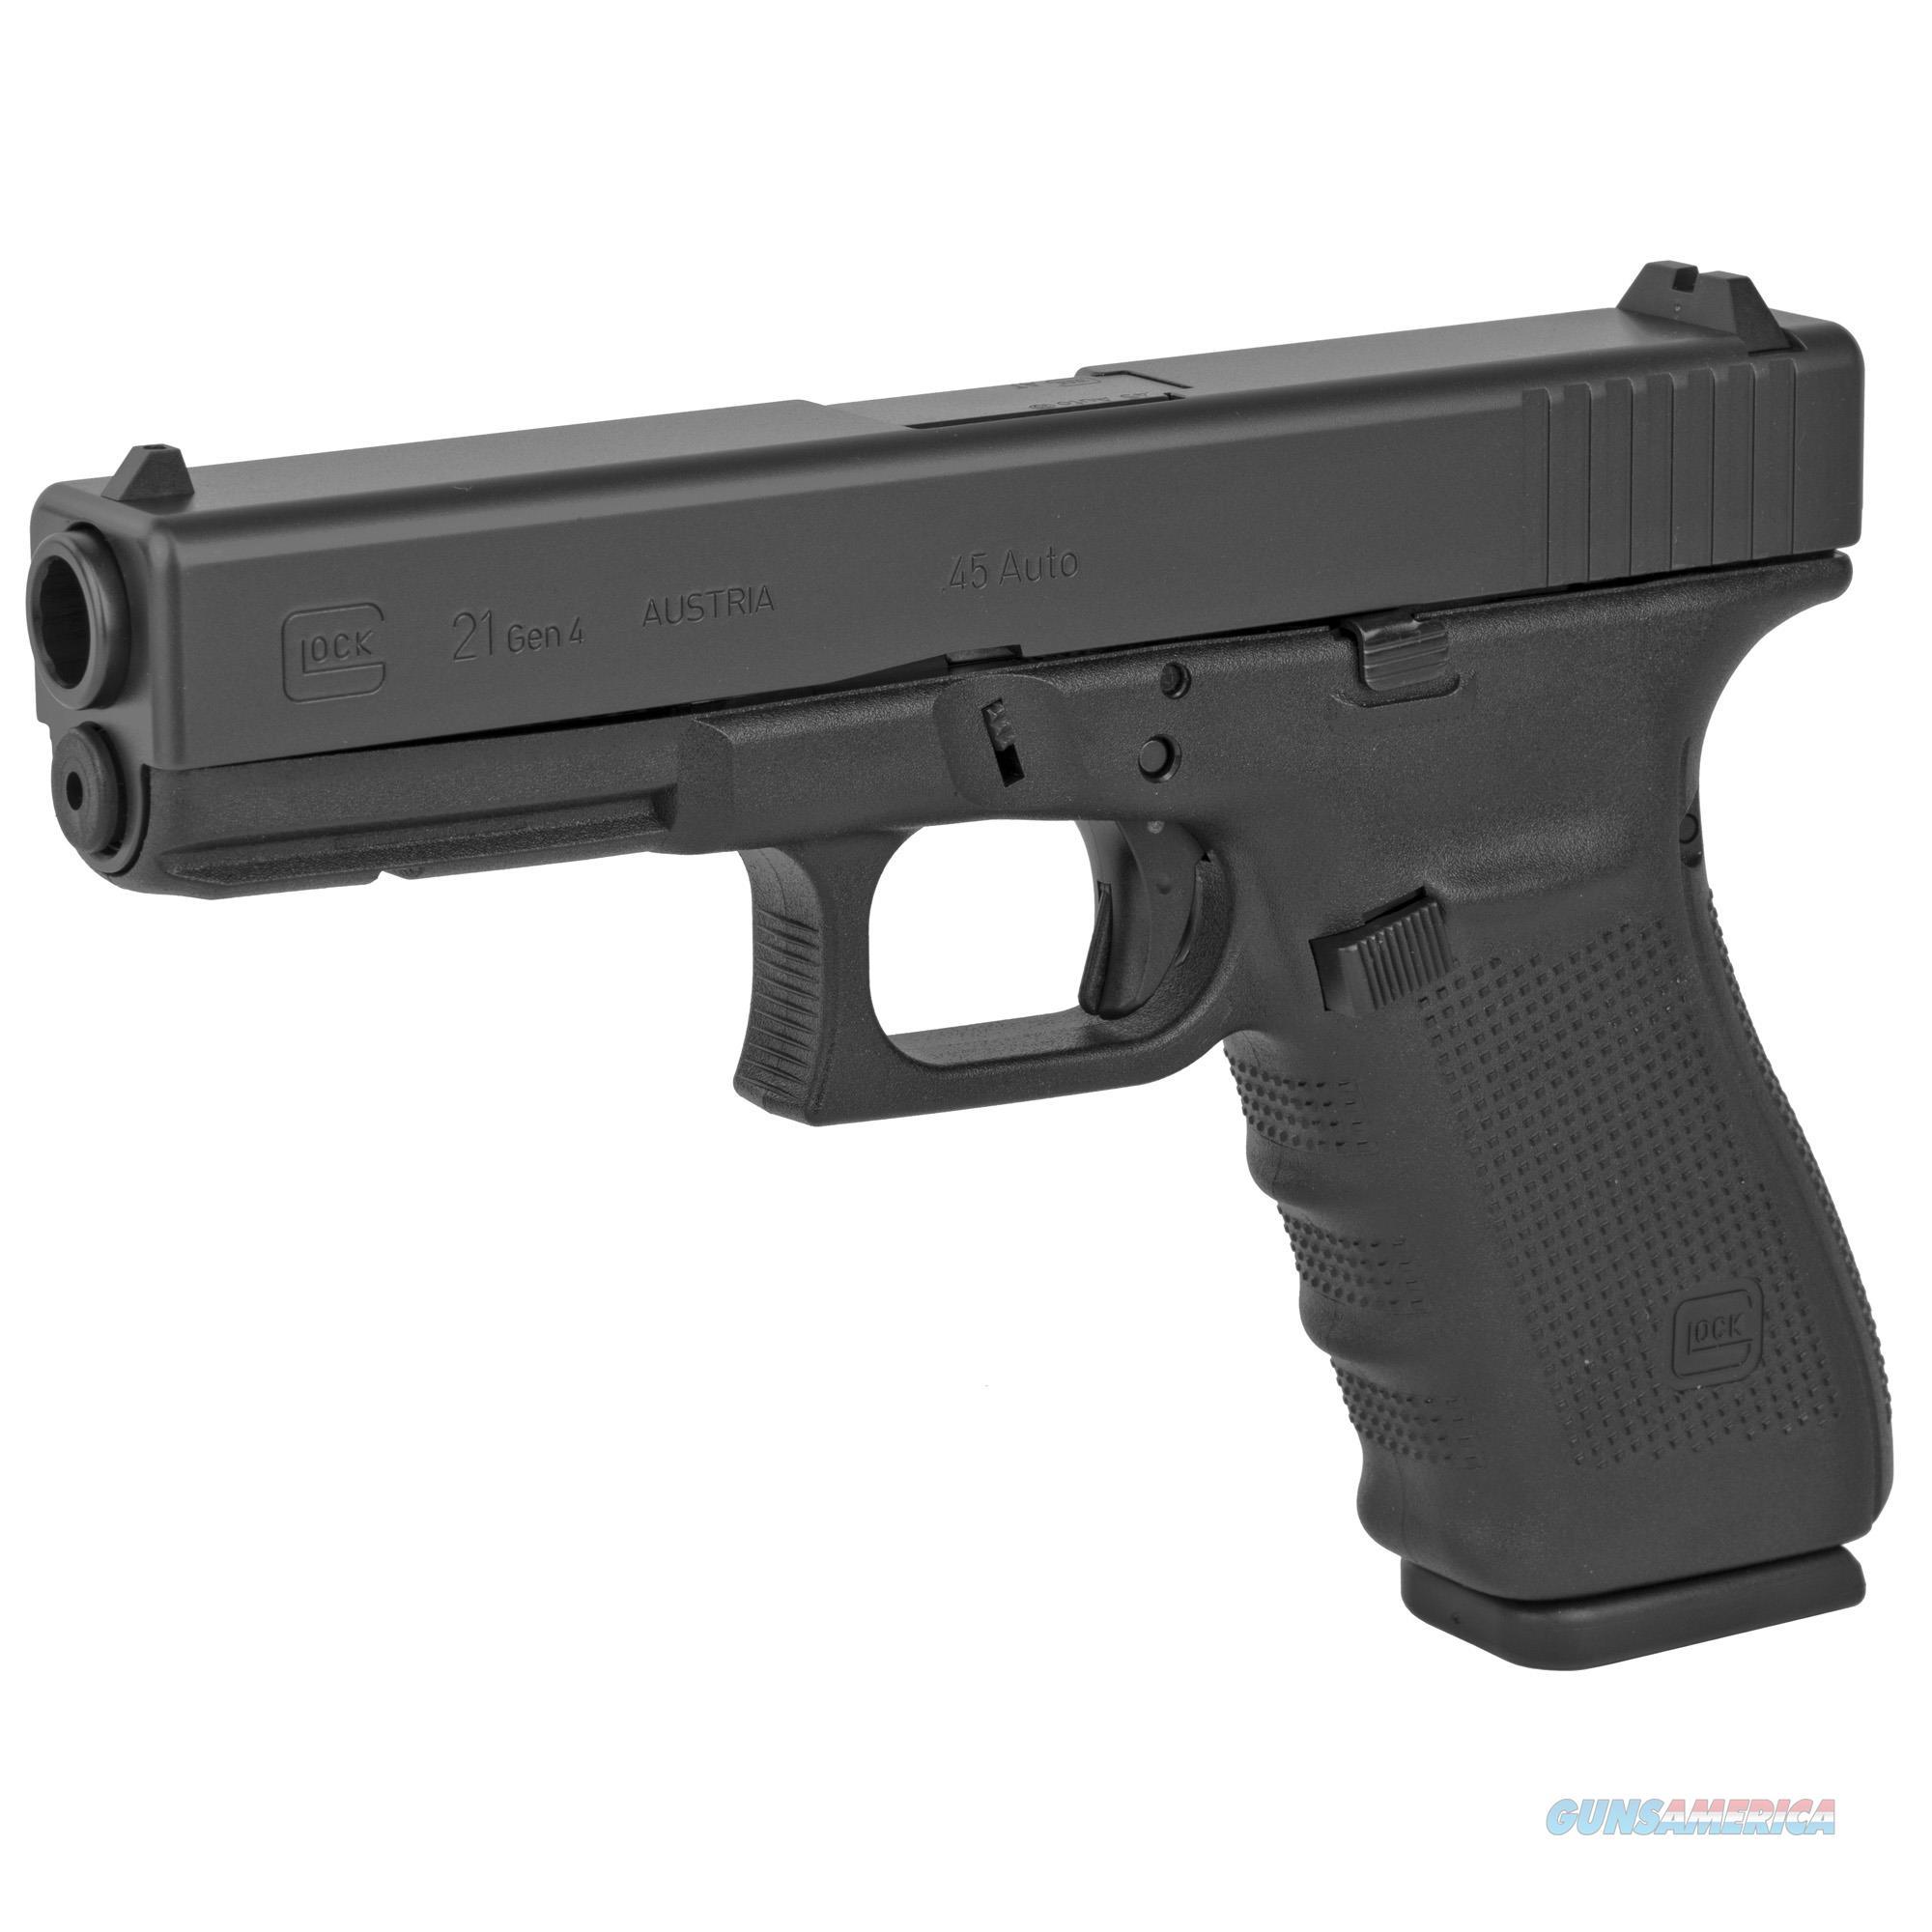 Glock 21 Gen4 .45 ACP Pistol - New in Case  Guns > Pistols > Glock Pistols > 20/21